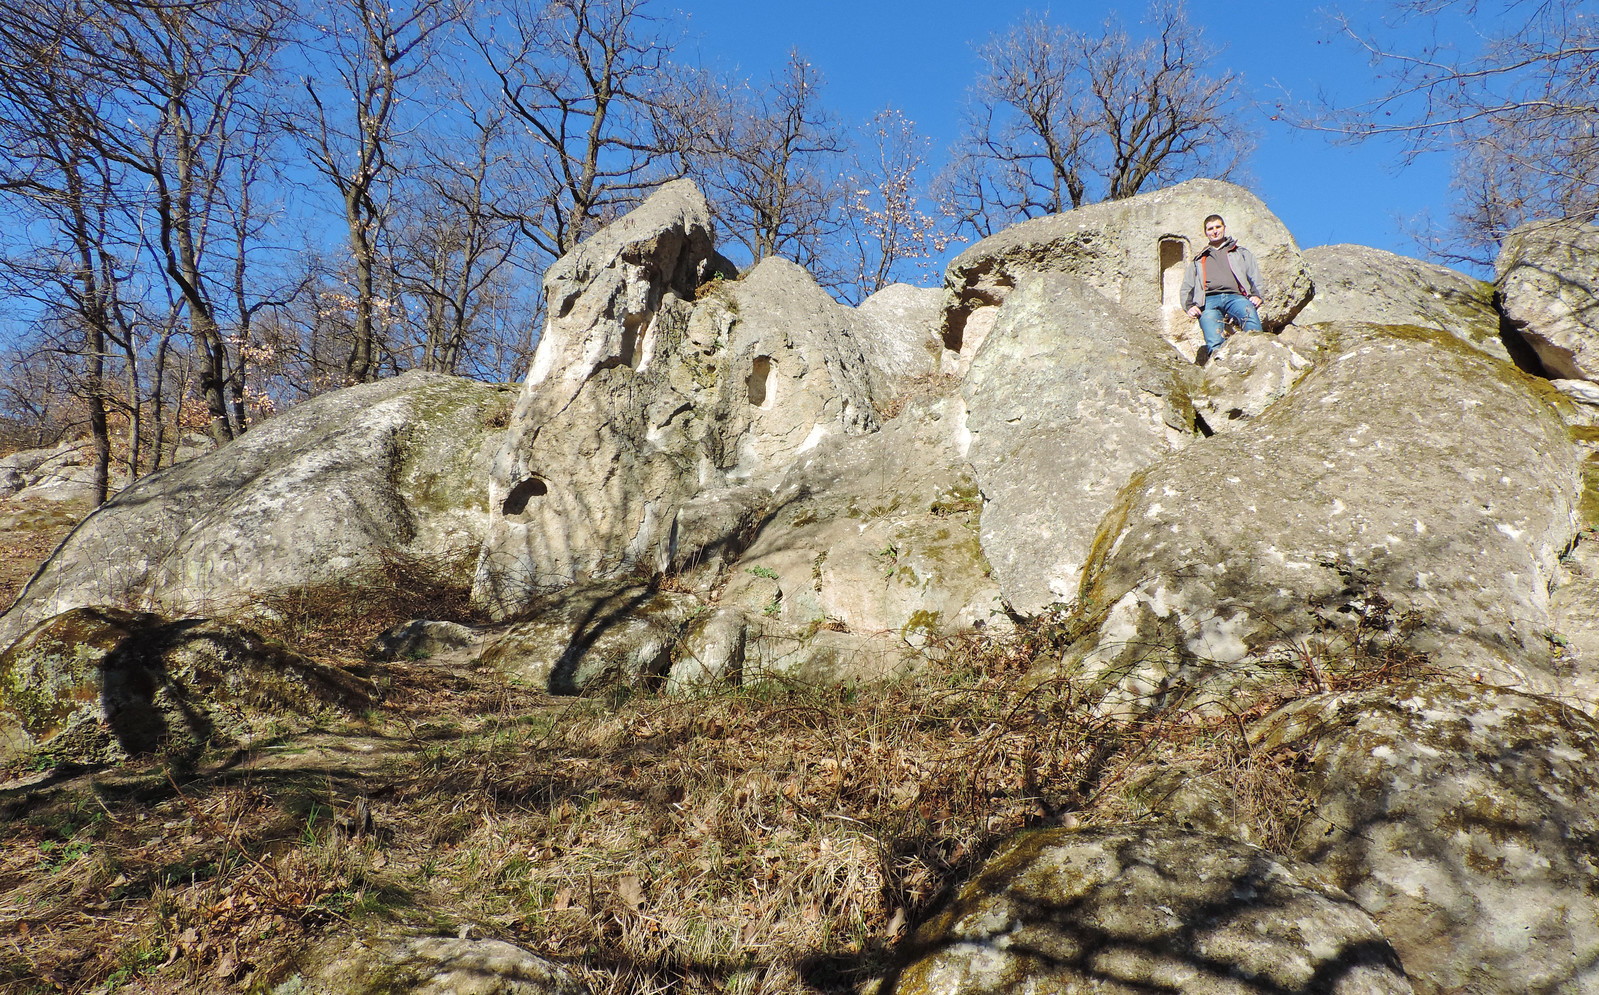 Rock formations of Szomolya, Bükk National Park, Hungary